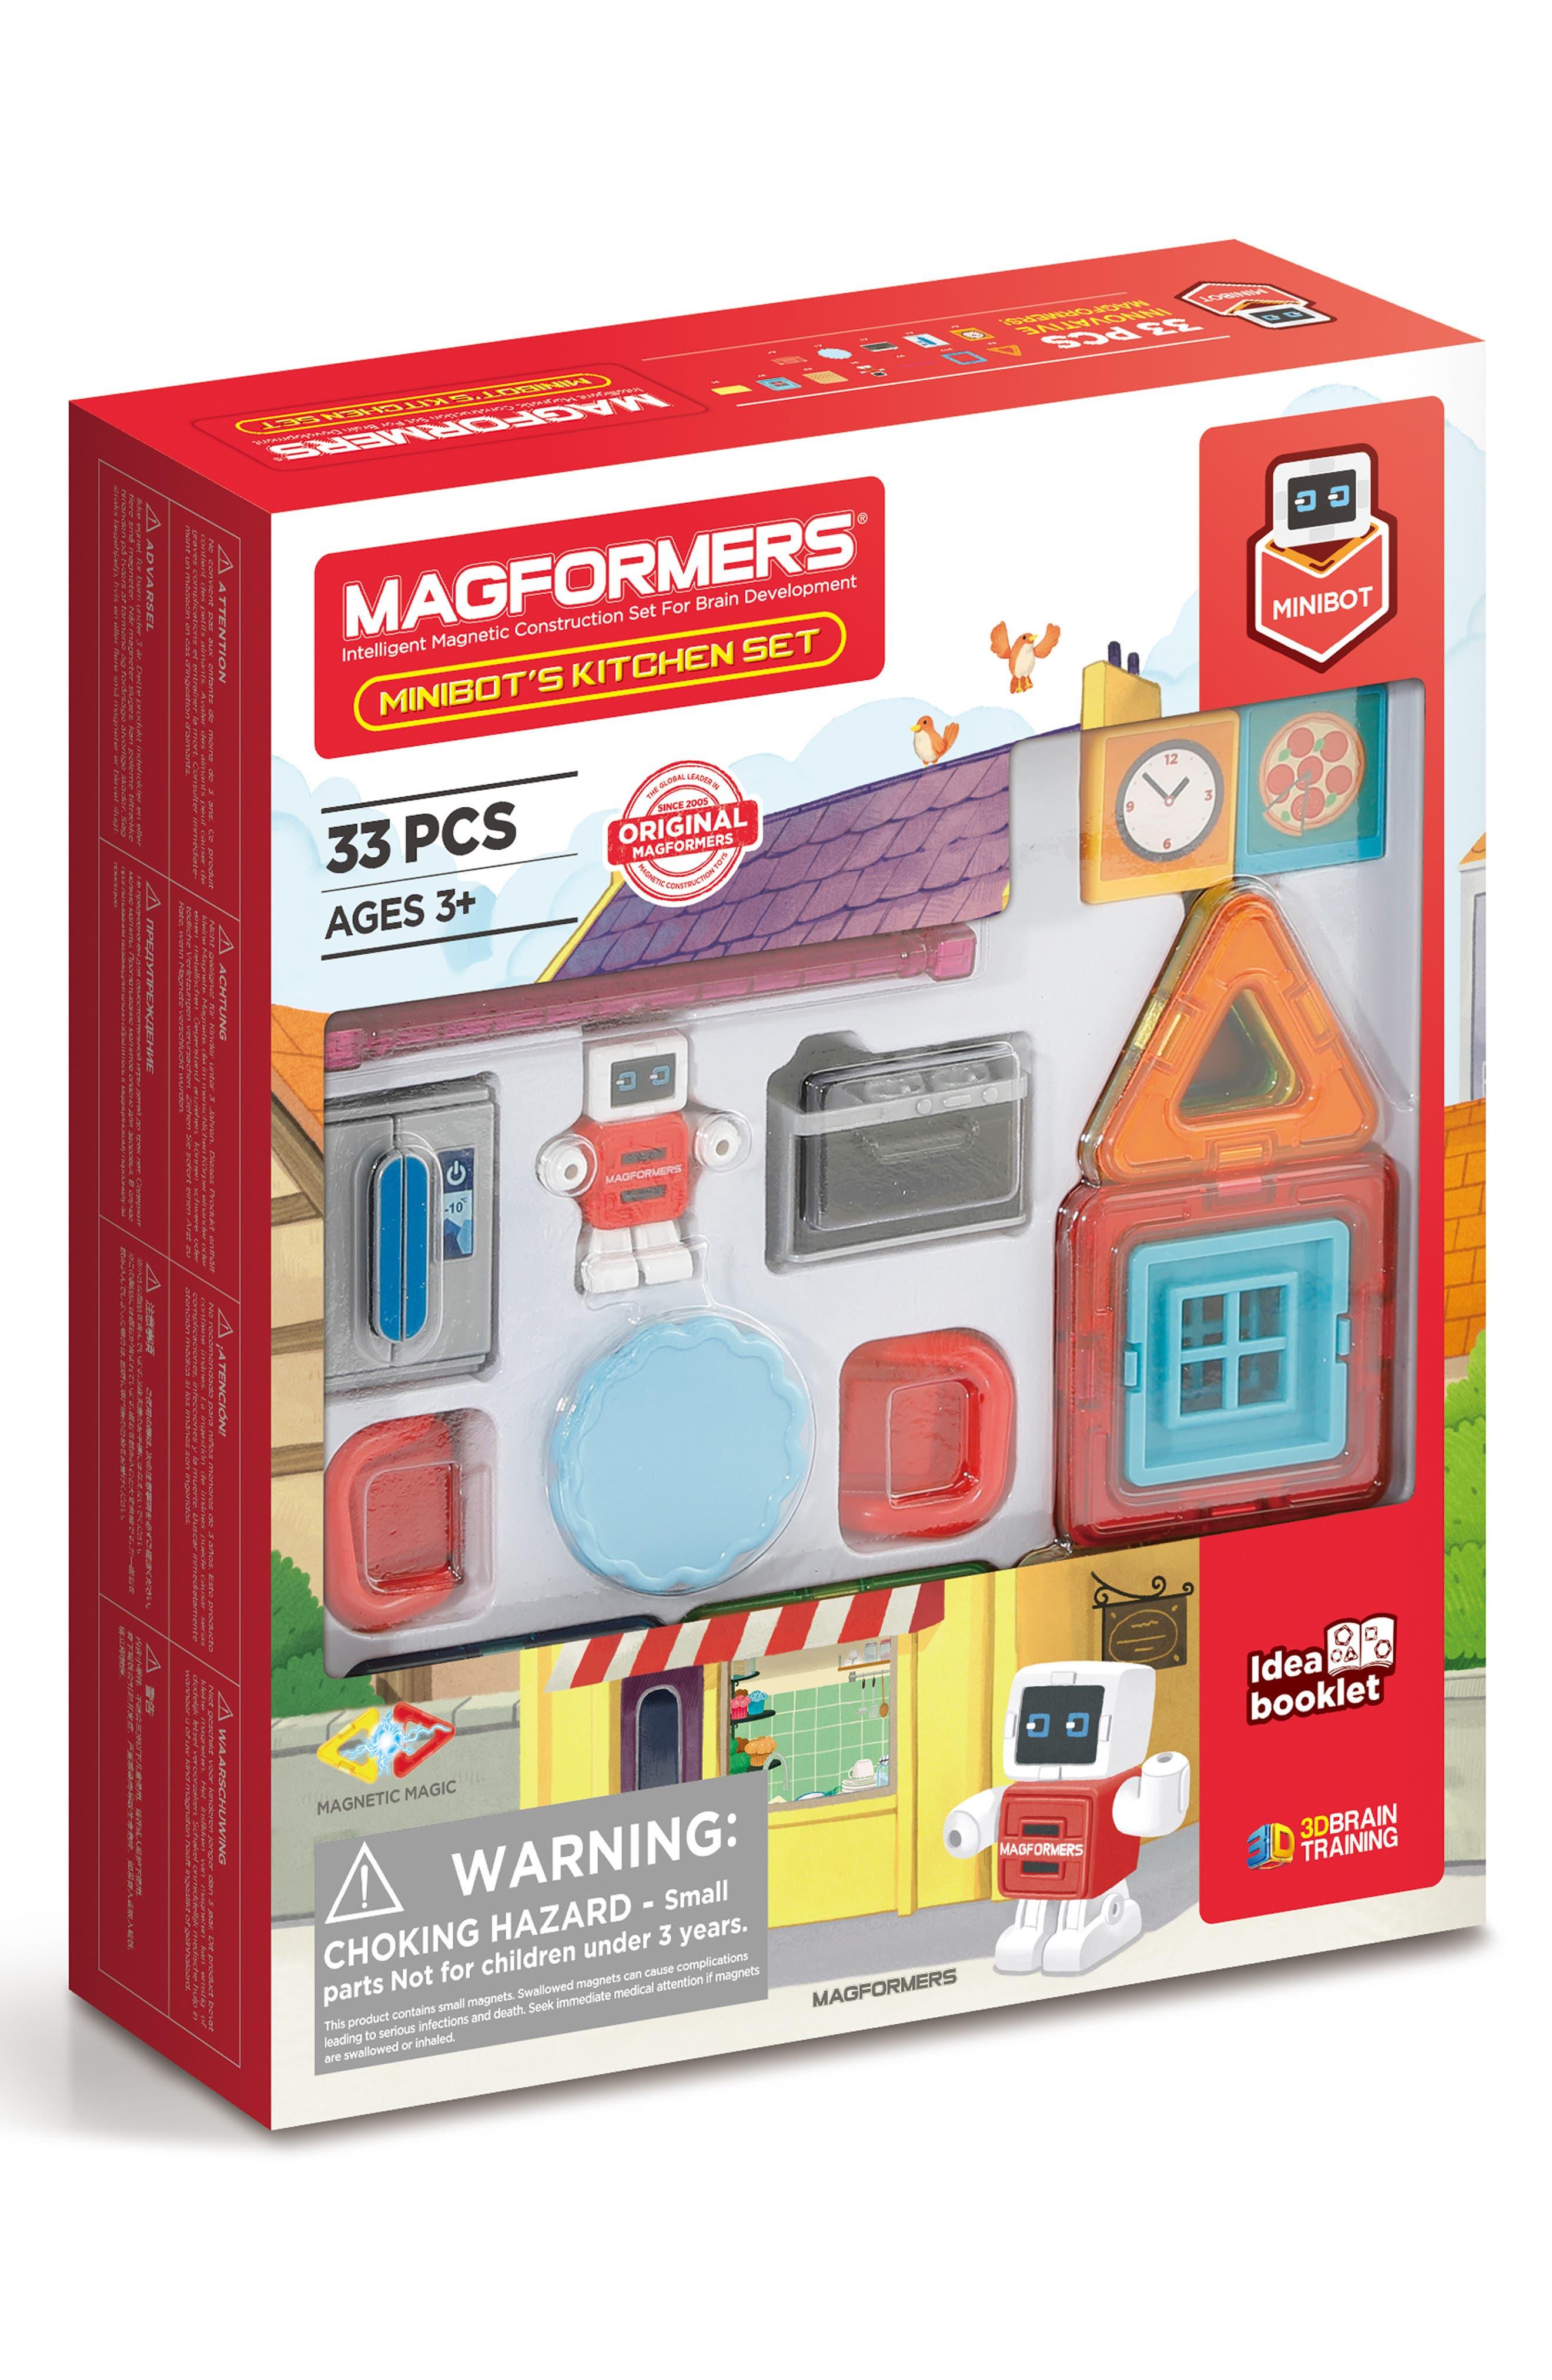 Magformers Minibot Kitchen 33-Piece Magnetic Construction Set